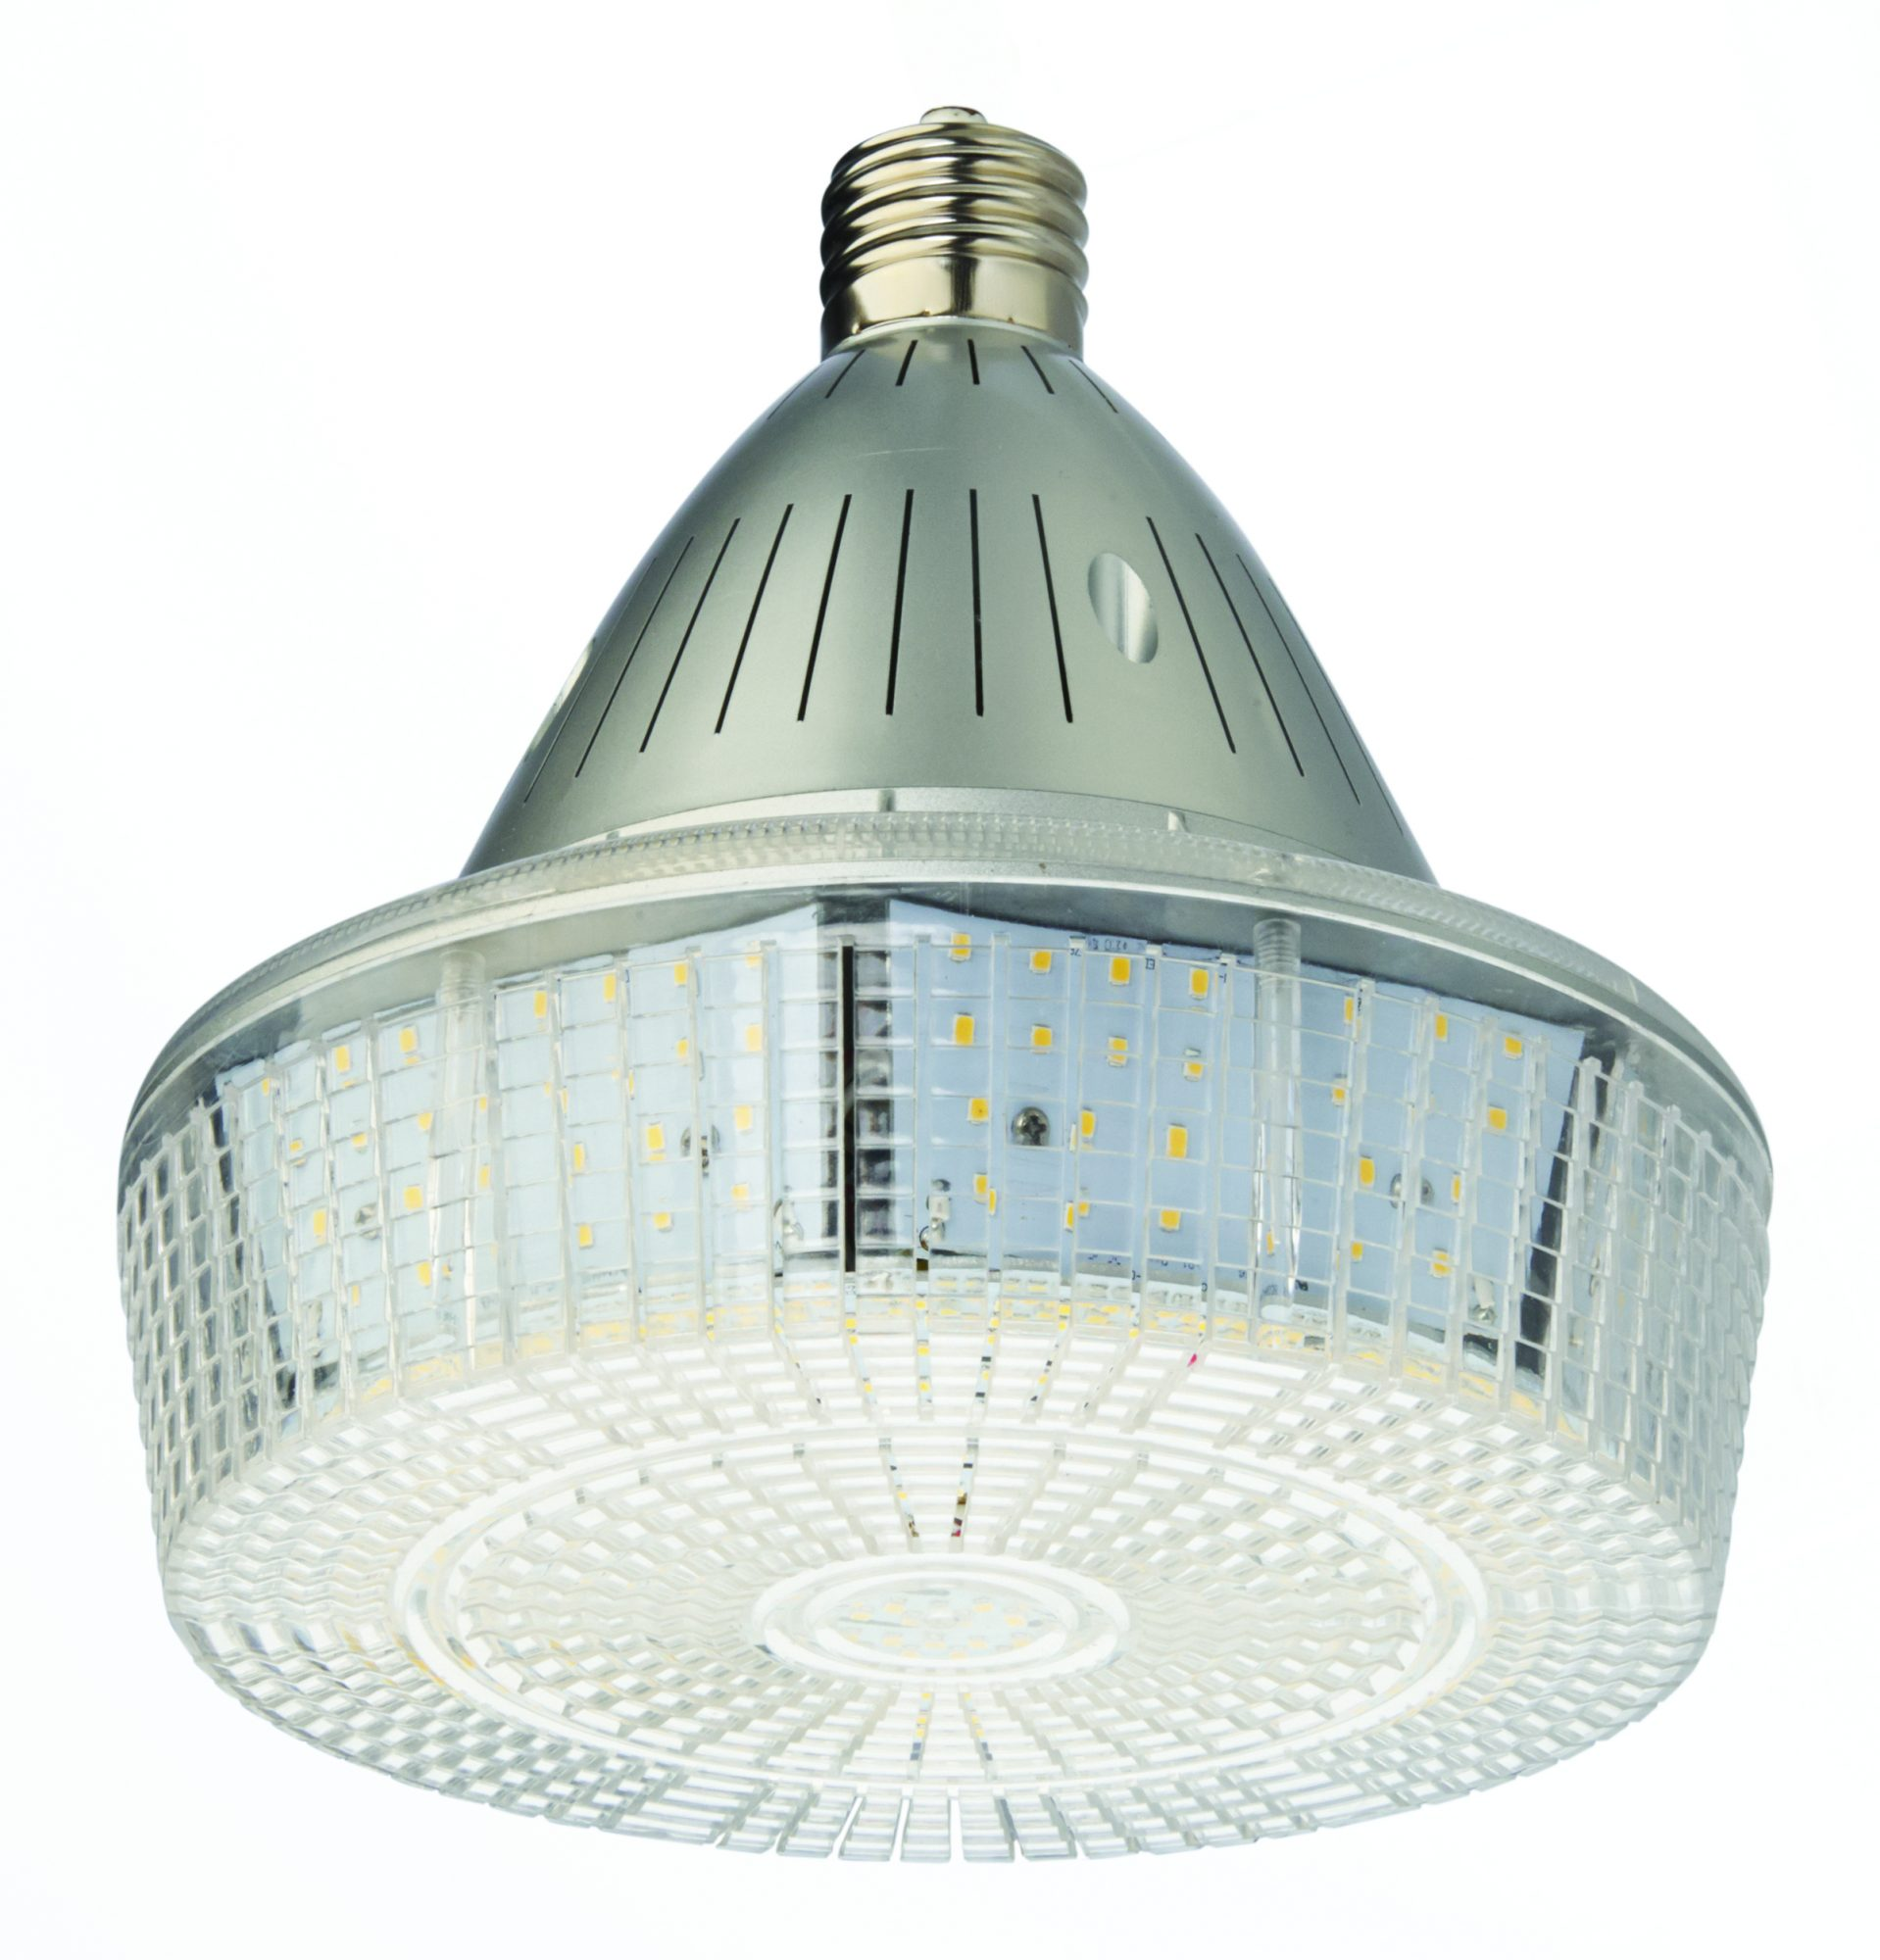 Light Efficient Design Uk Launches Multi Directional